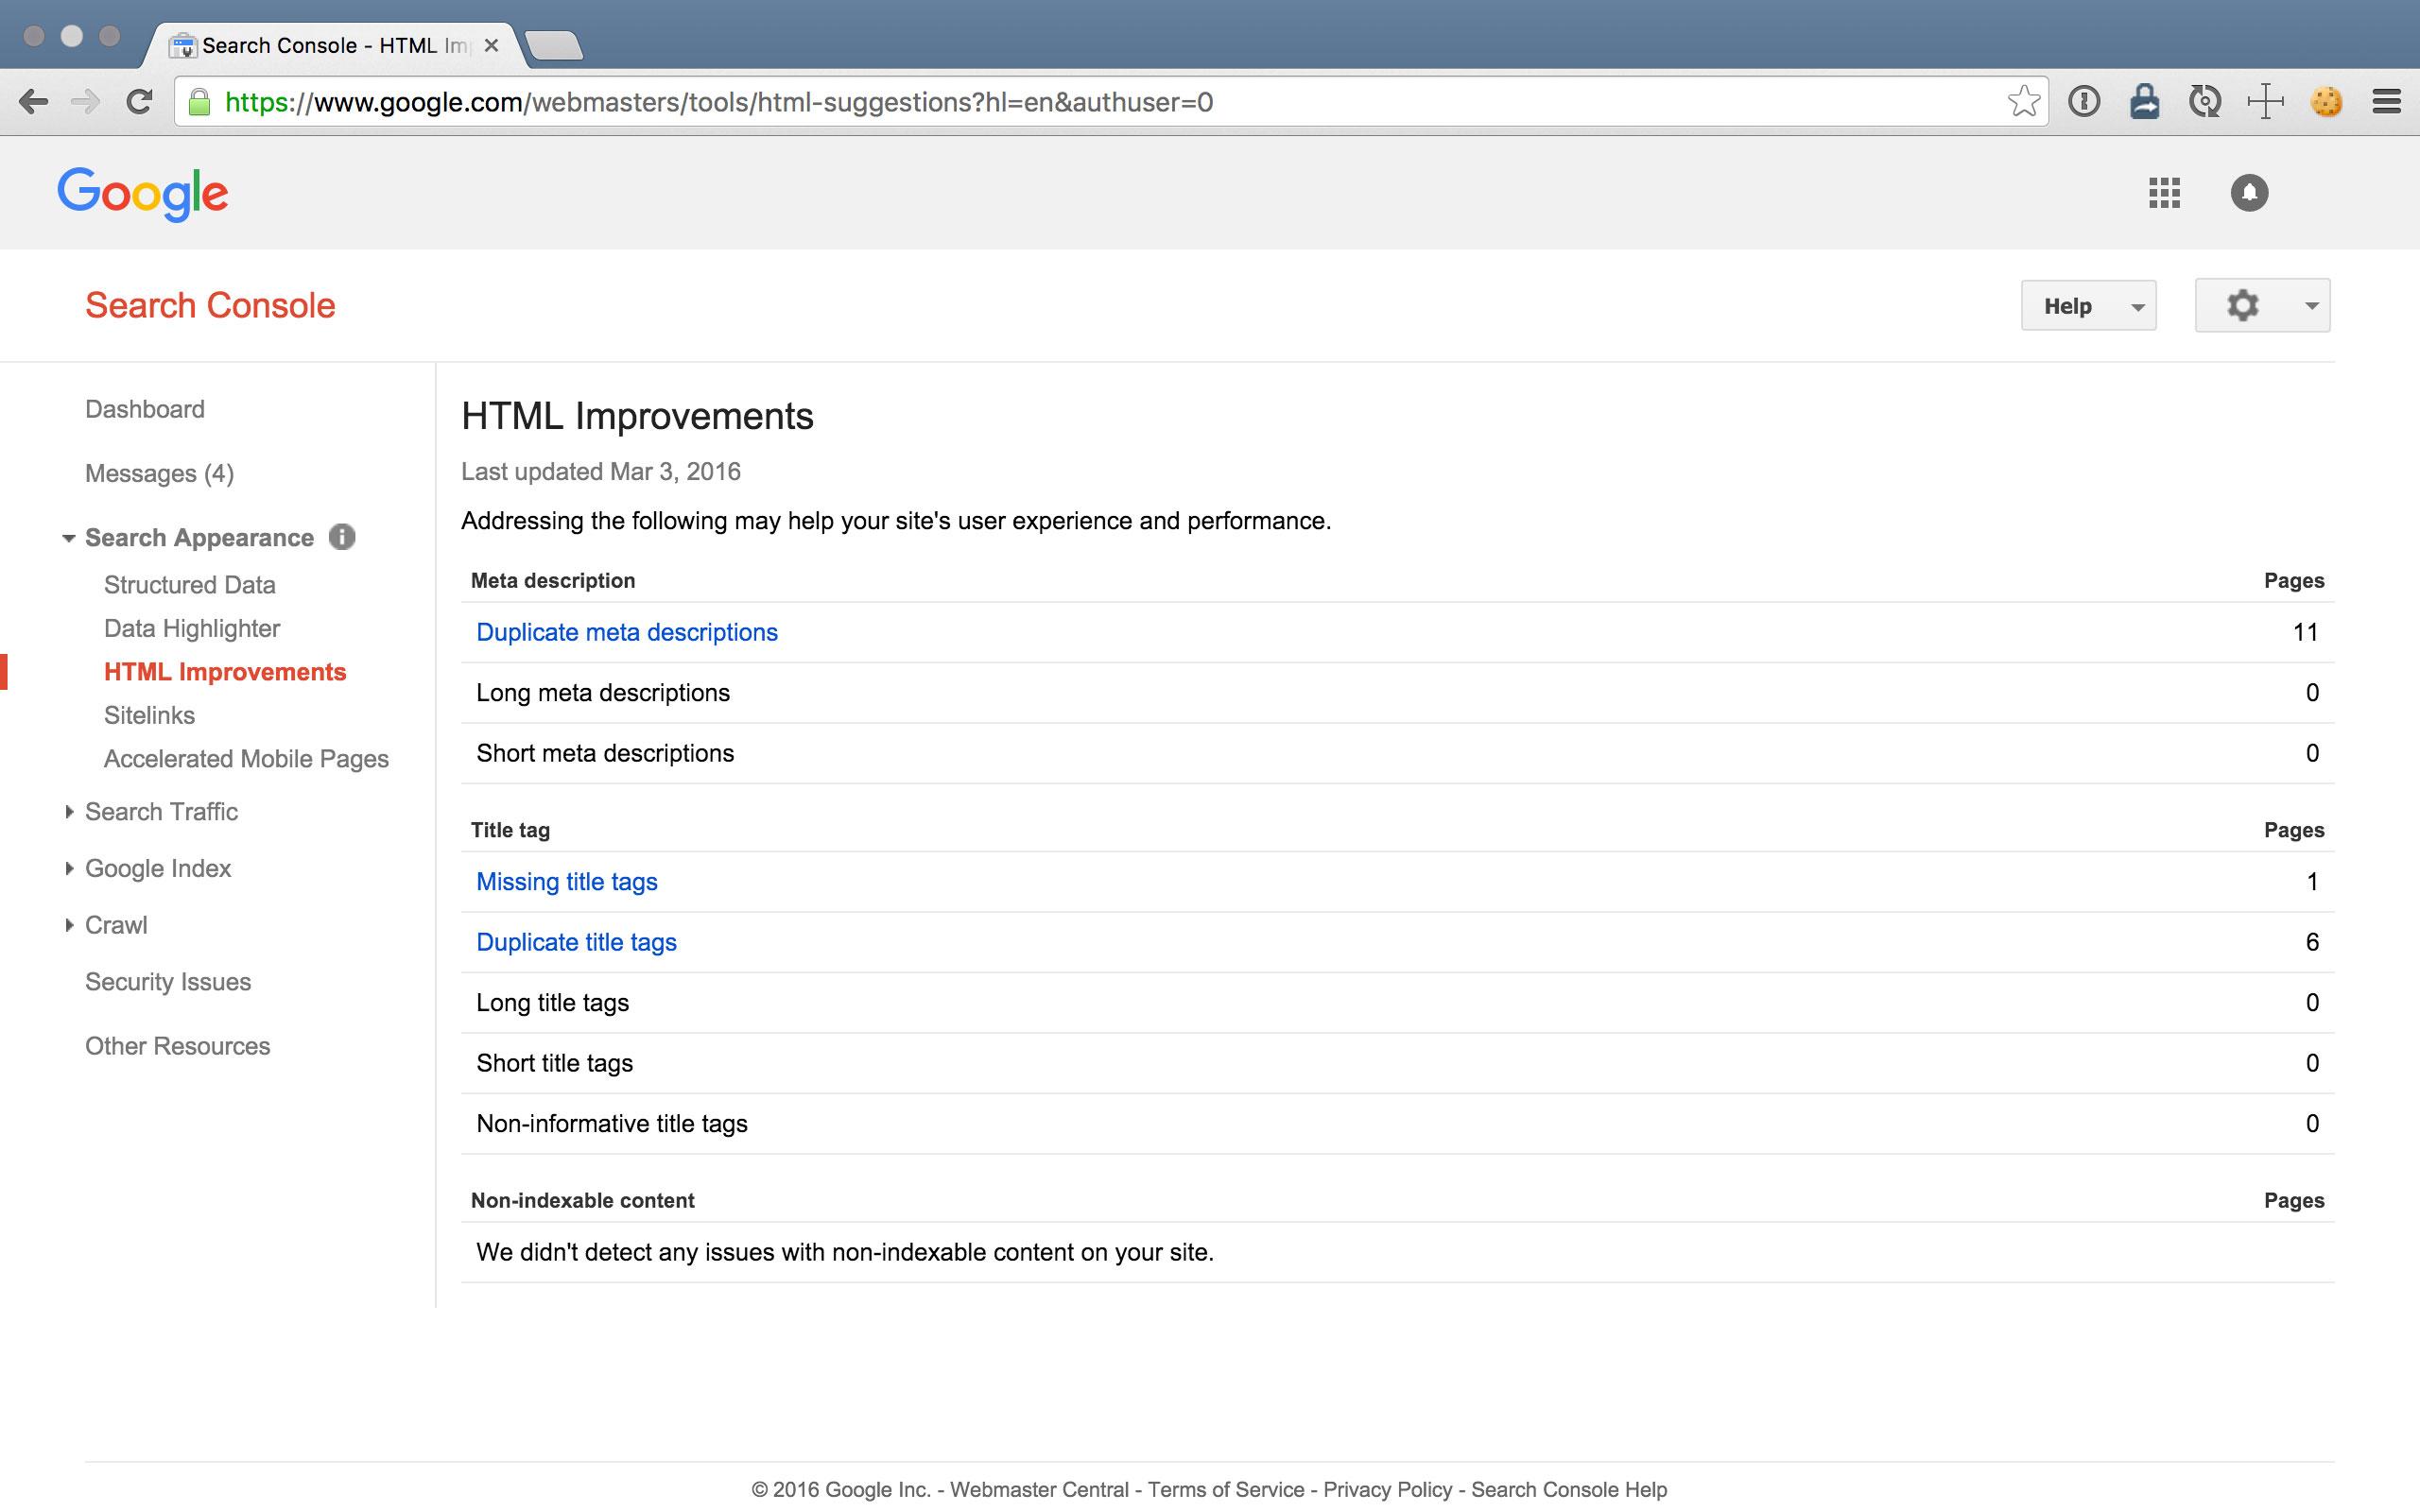 search-console-html-improvements